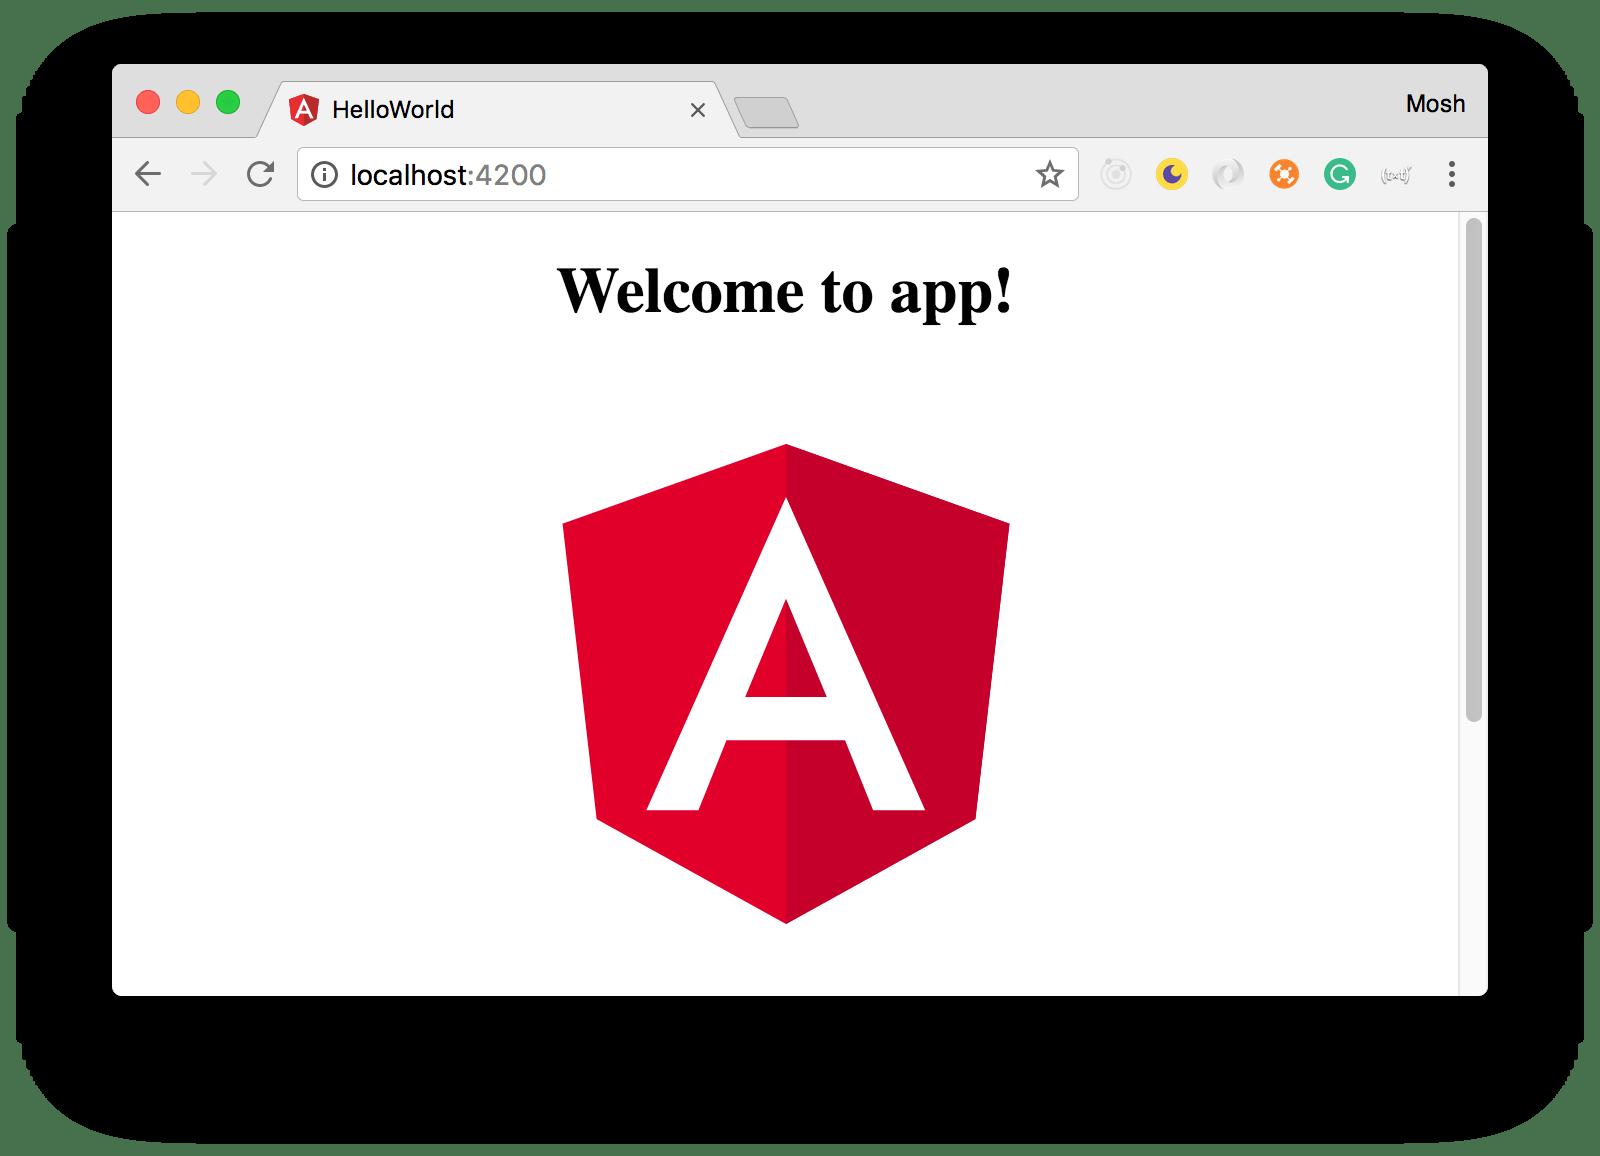 angular 4 tutorial: angular 4 in 20 minutes - programming with mosh